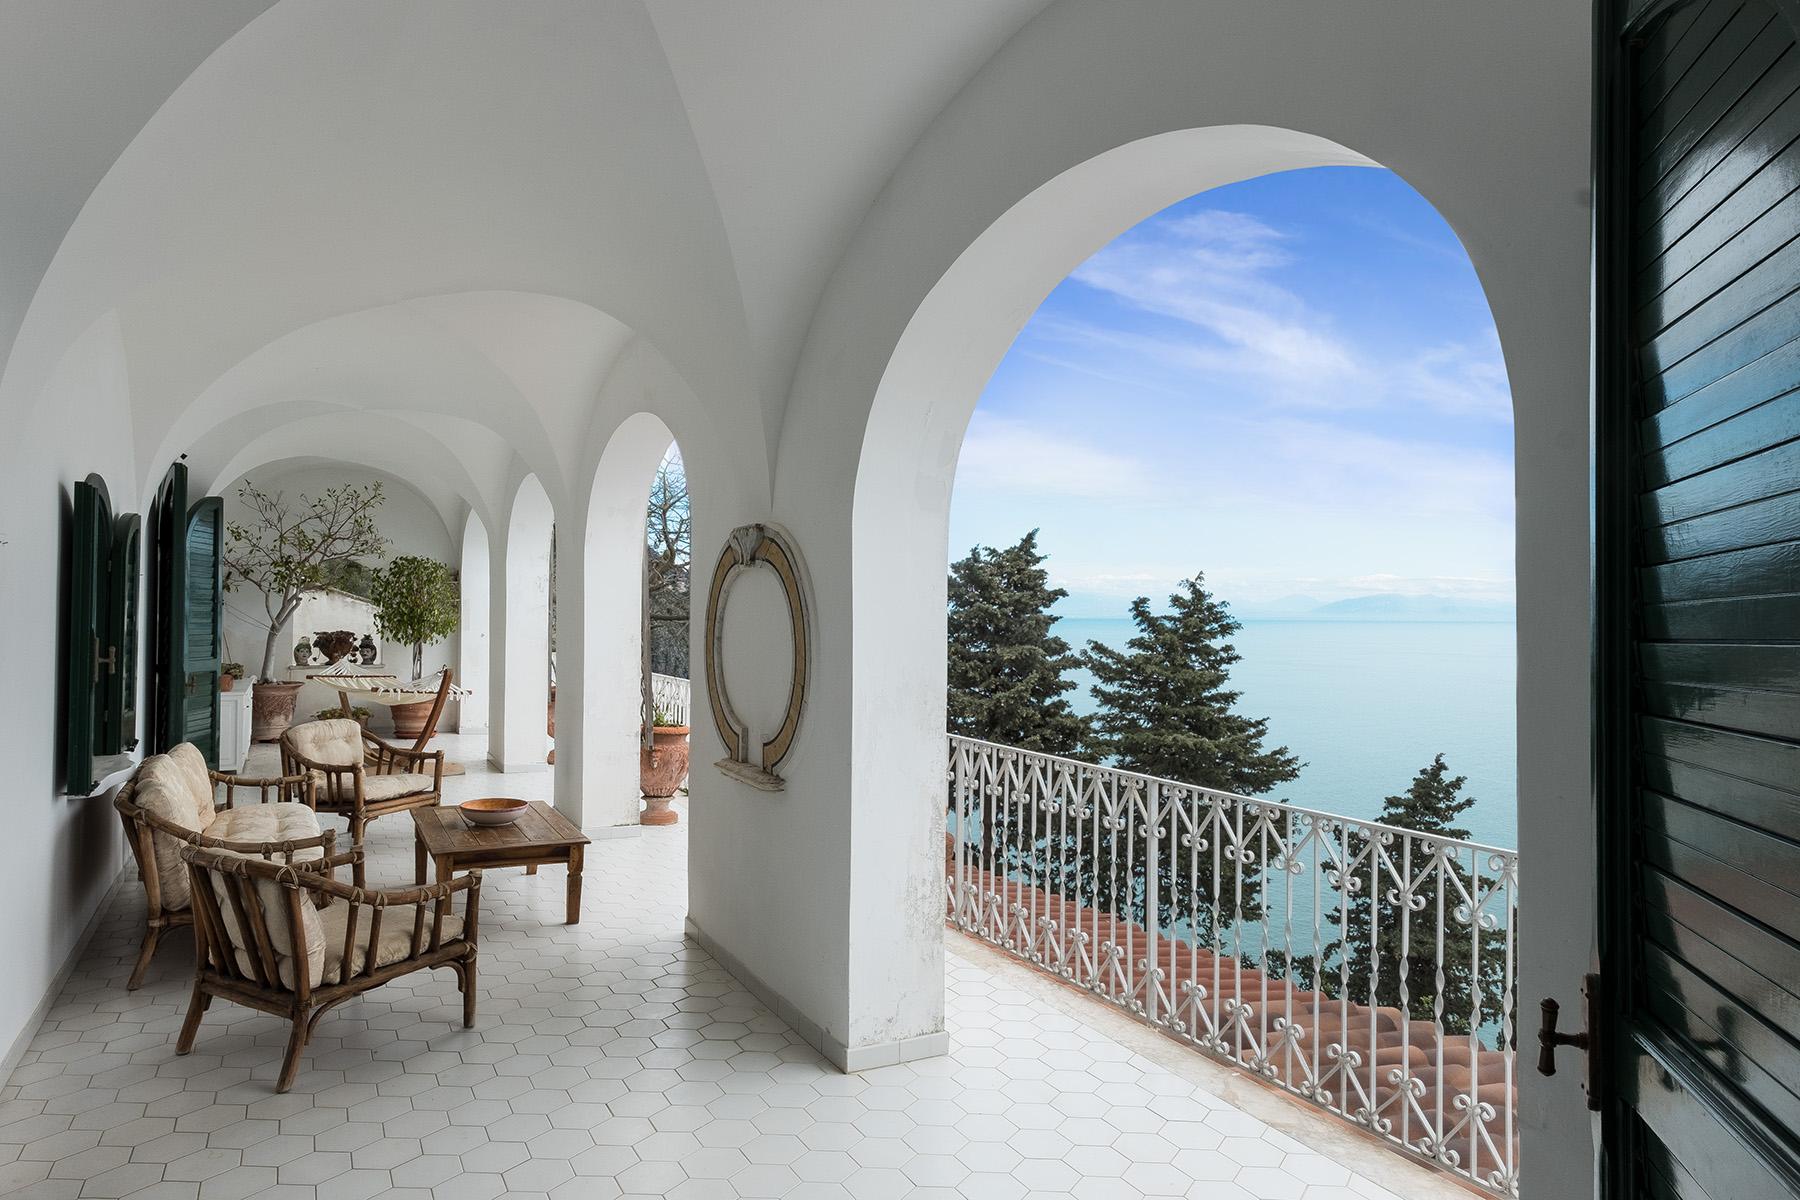 Casa indipendente in Vendita a Praiano: 4 locali, 250 mq - Foto 7